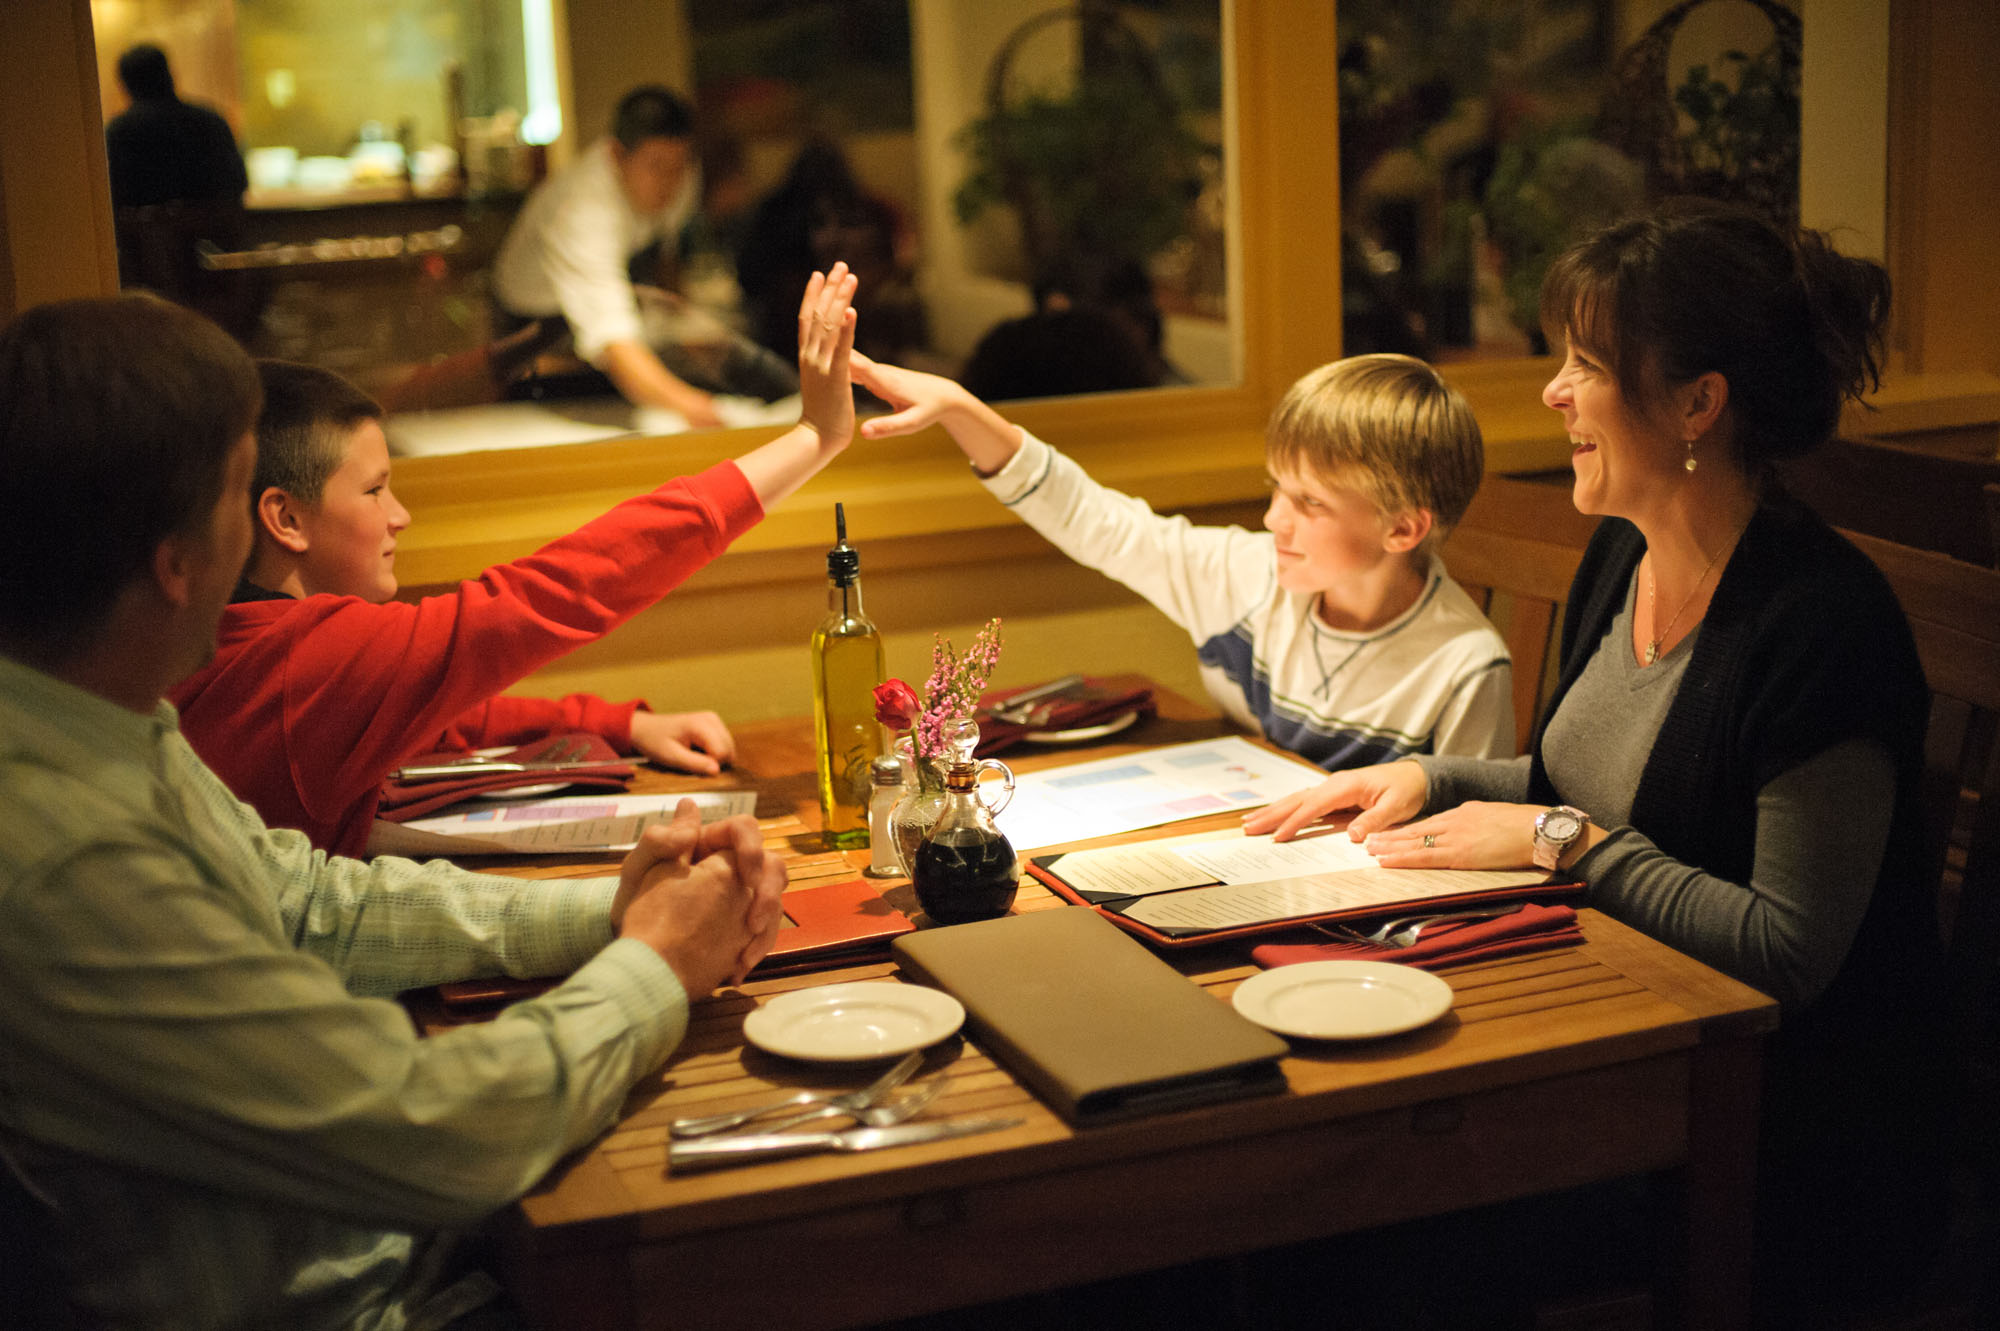 6500-Cruz_Cafe_Soquel_Restaurant_Photography_d700.jpg